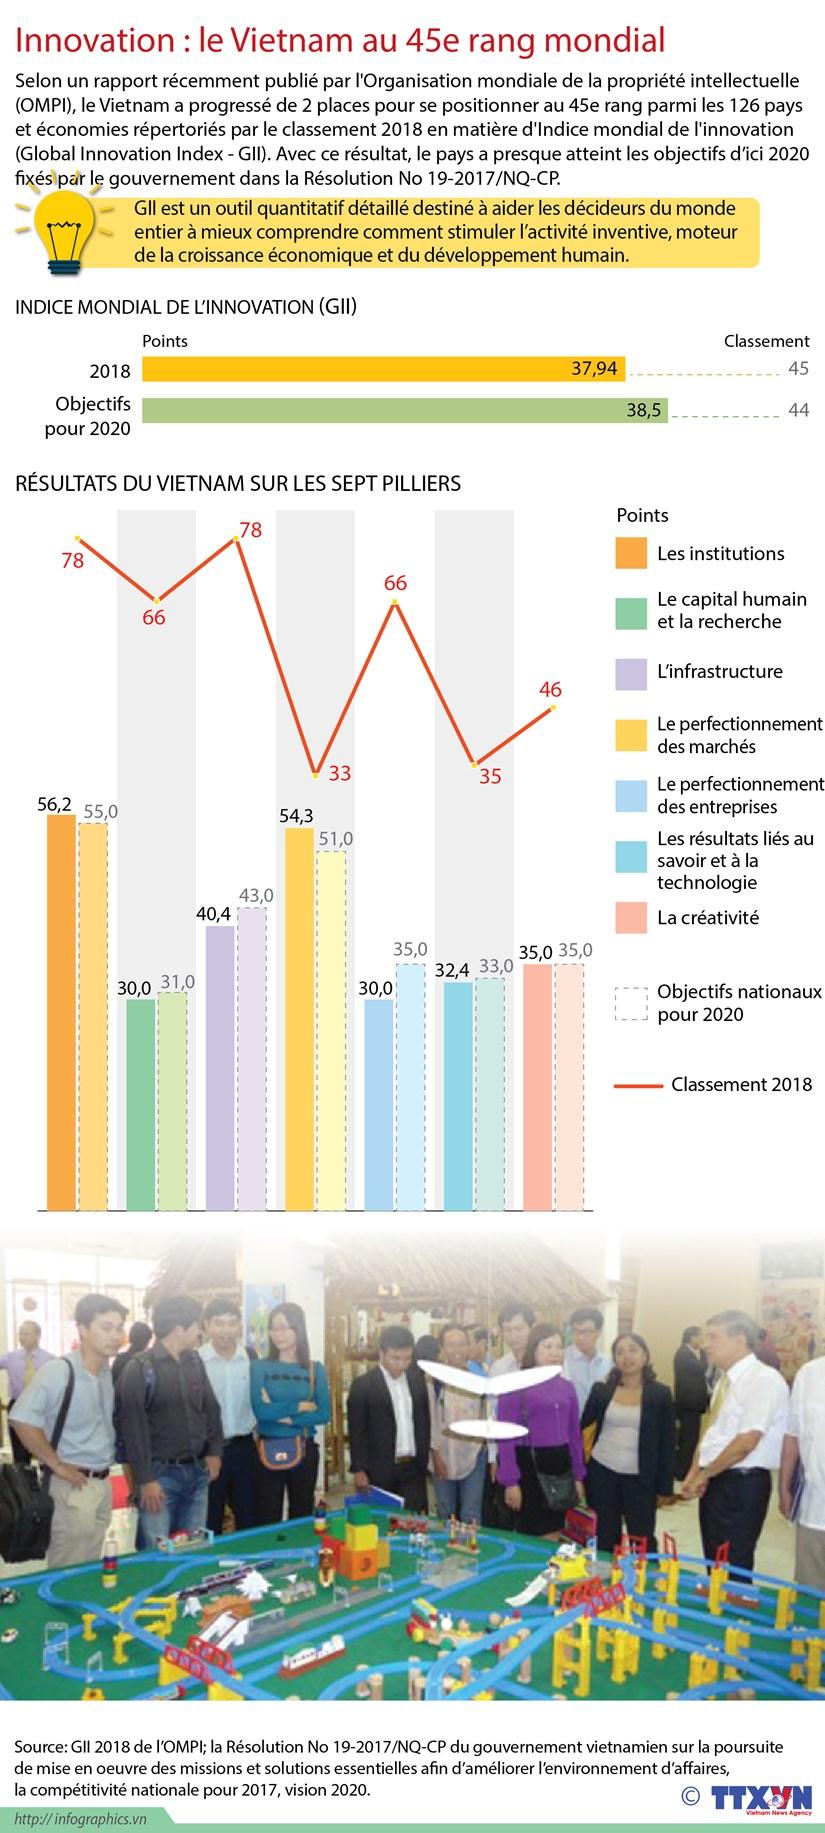 [Infographie] Innovation : le Vietnam au 45e rang mondial hinh anh 1